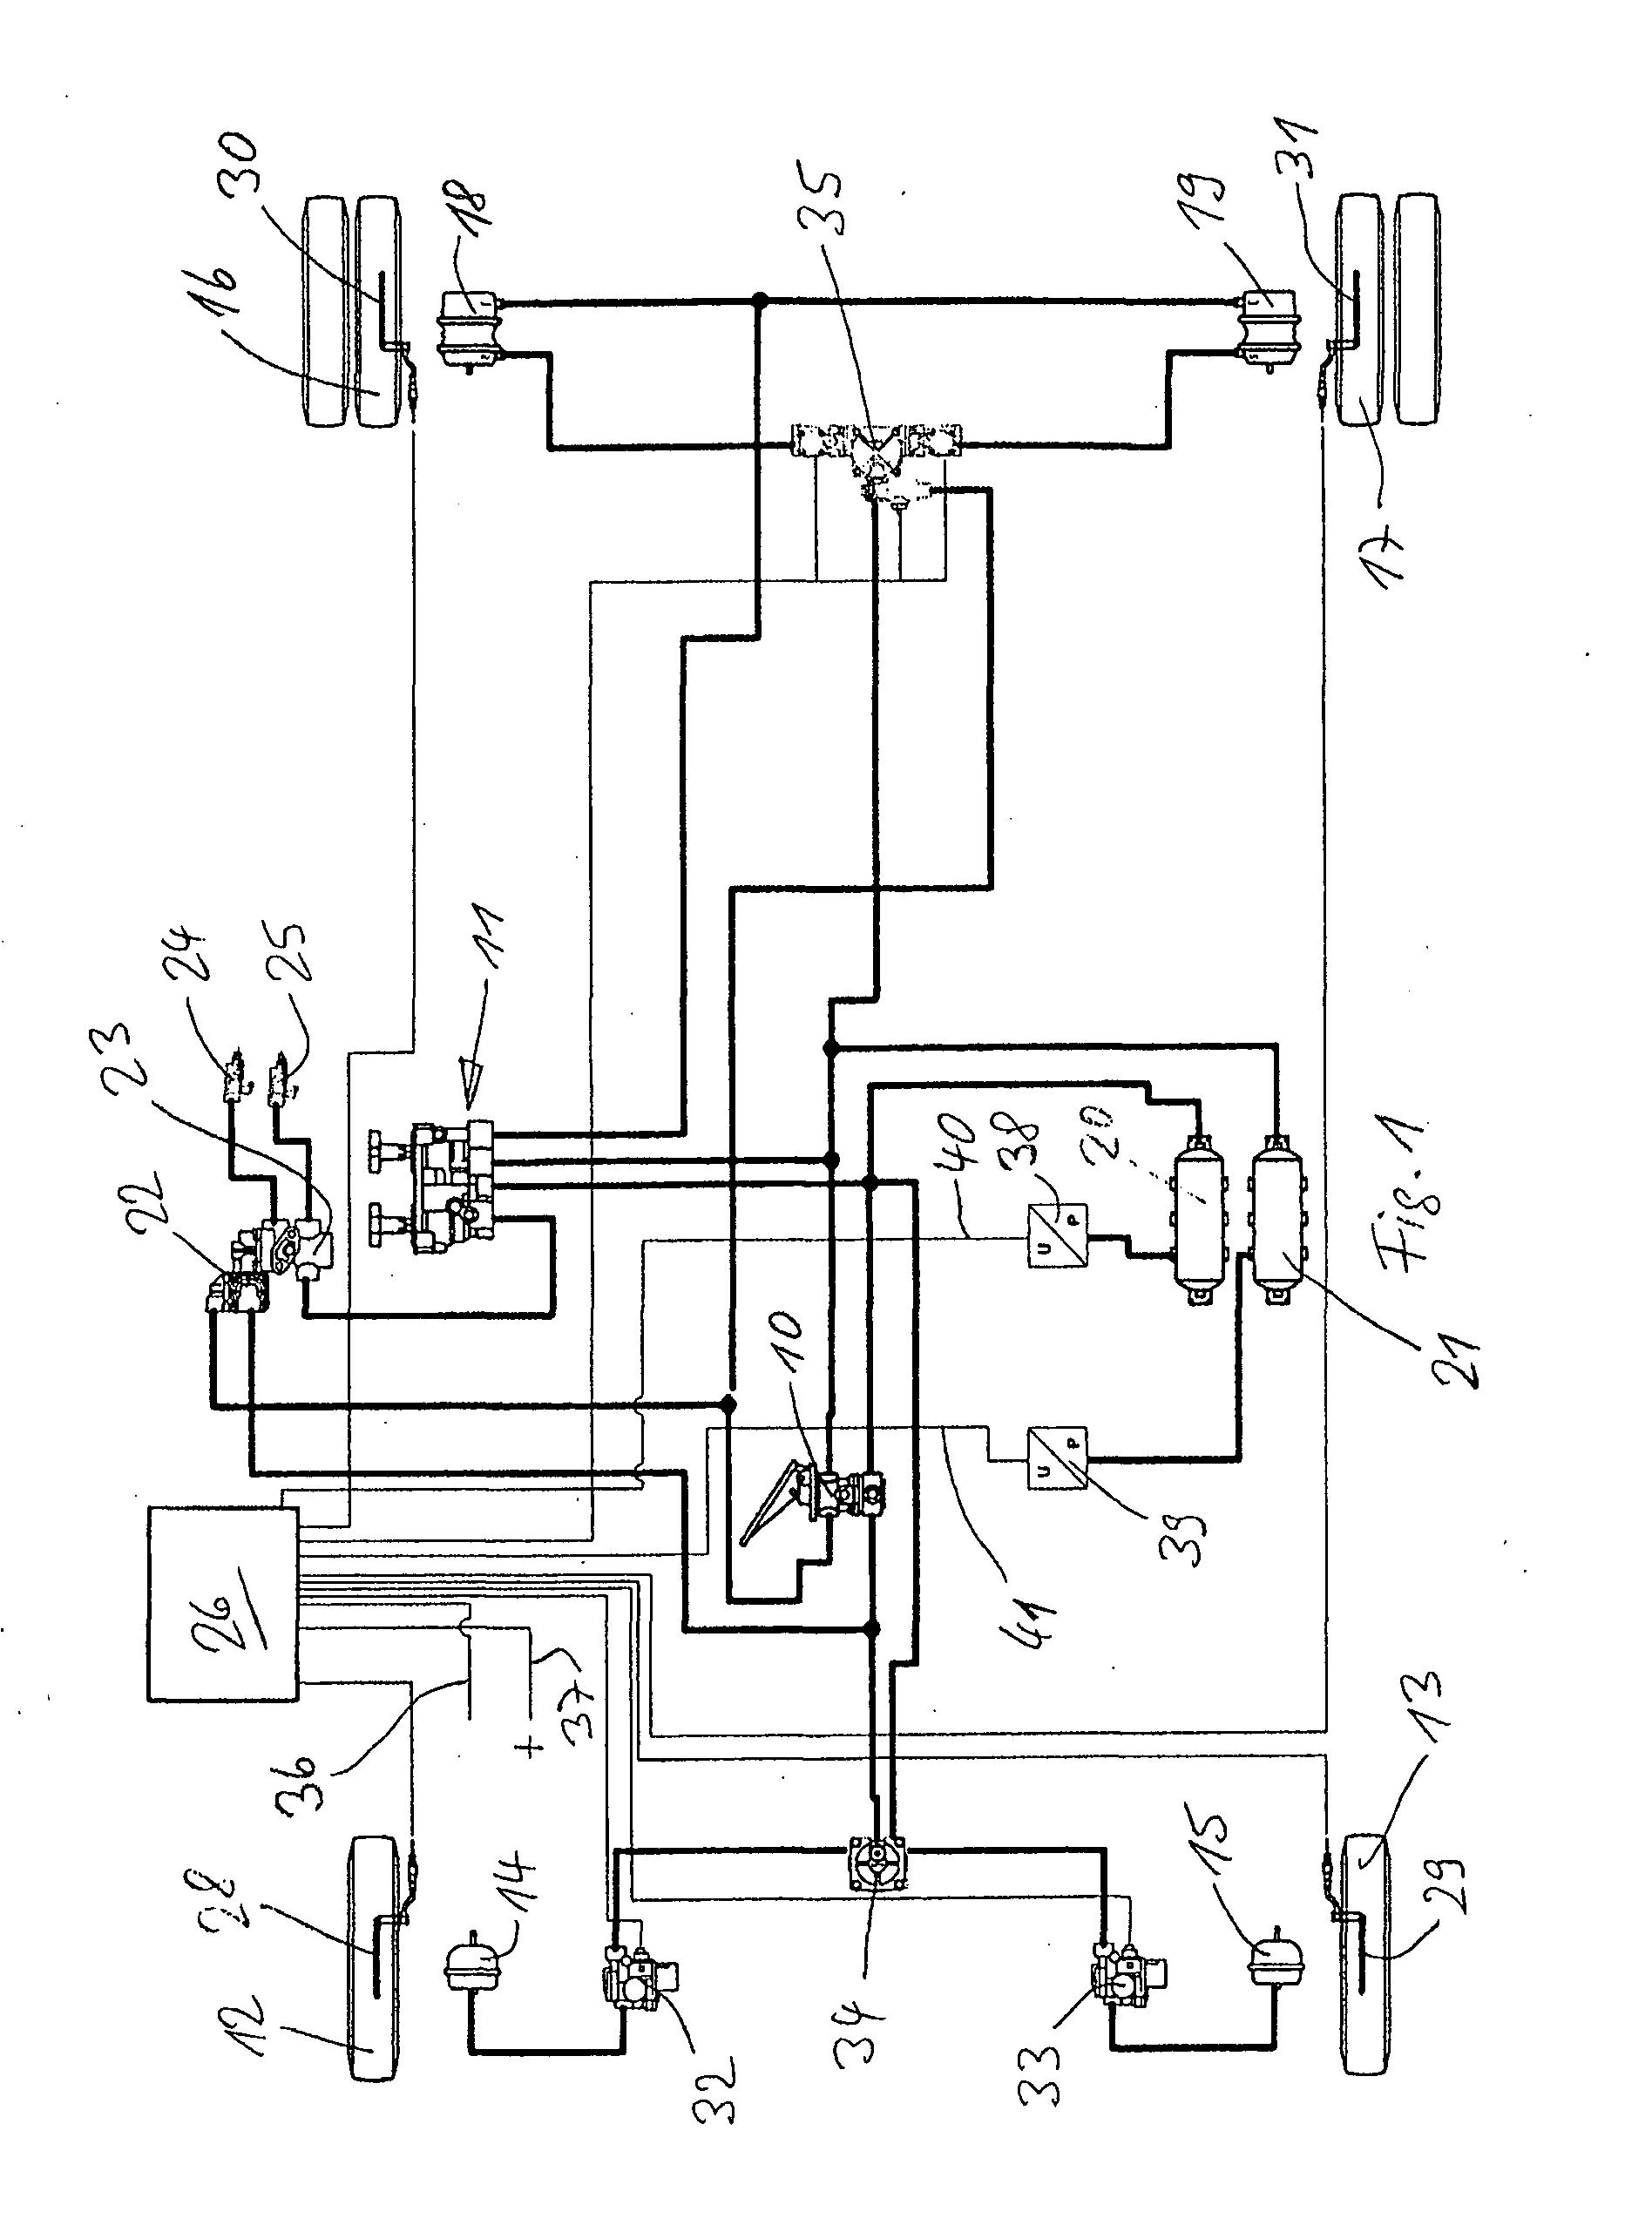 Haldex Modular Wiring Diagram